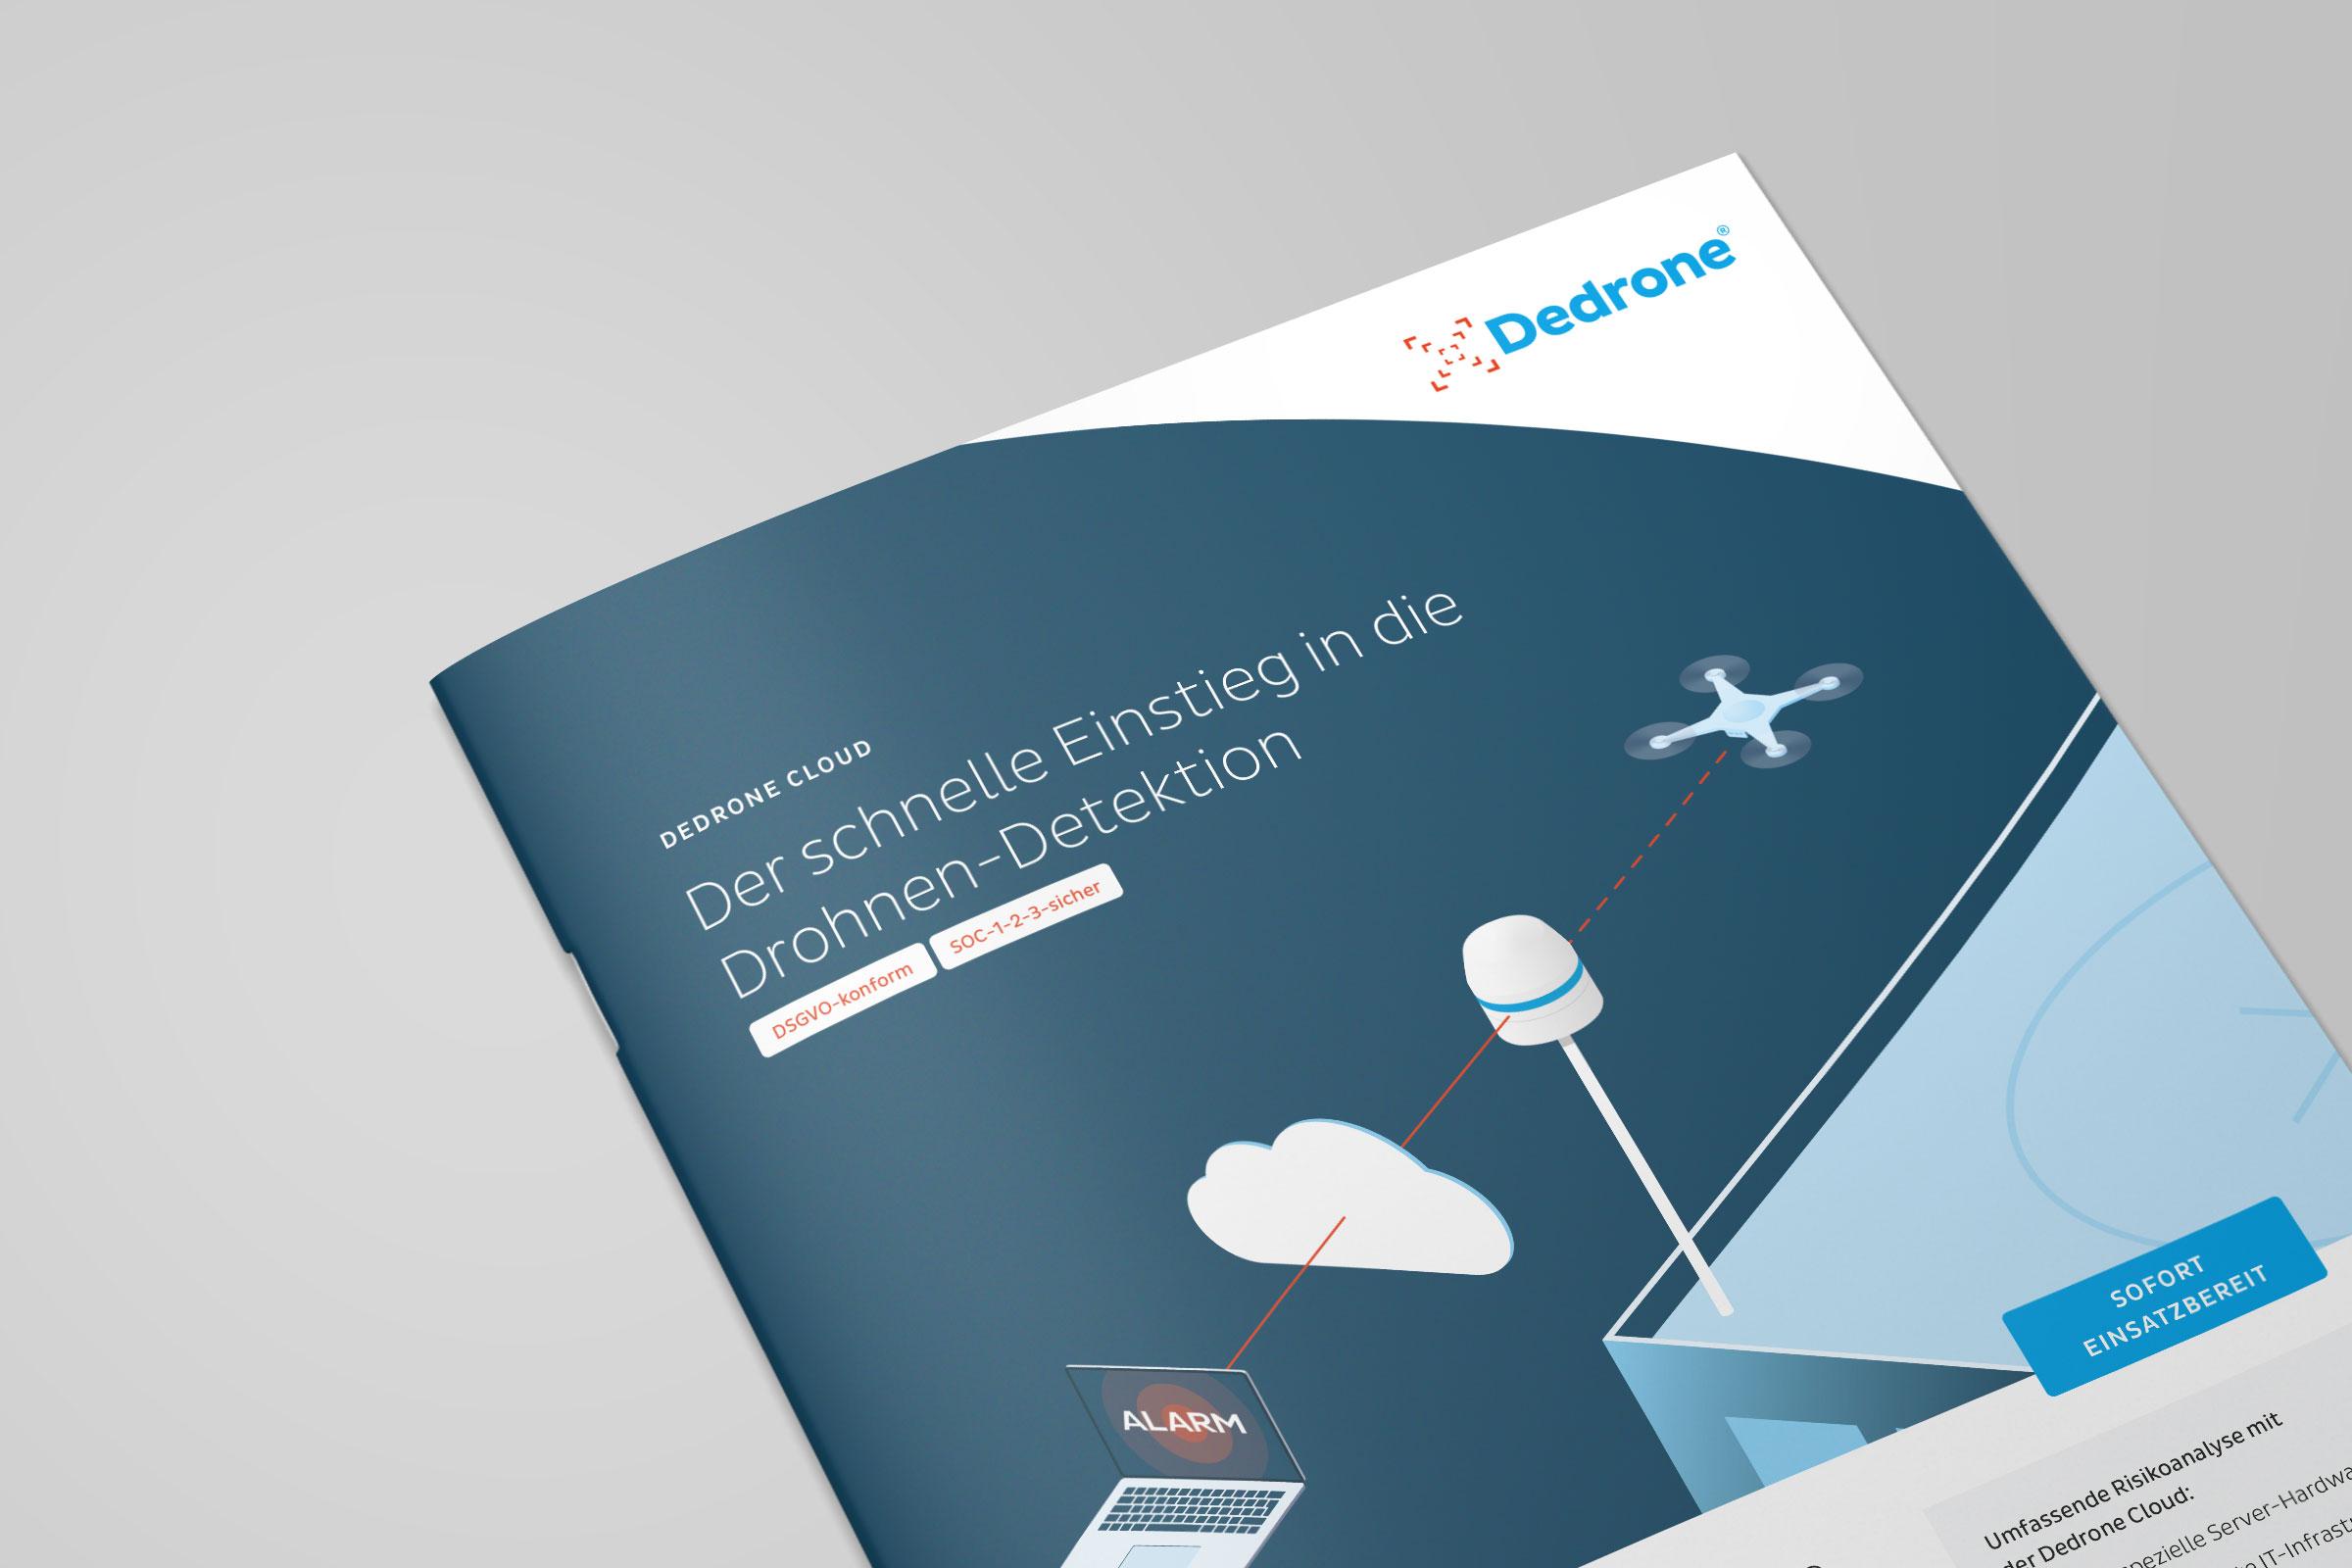 dedrone-whitepaper-cover-big-cloud-DE